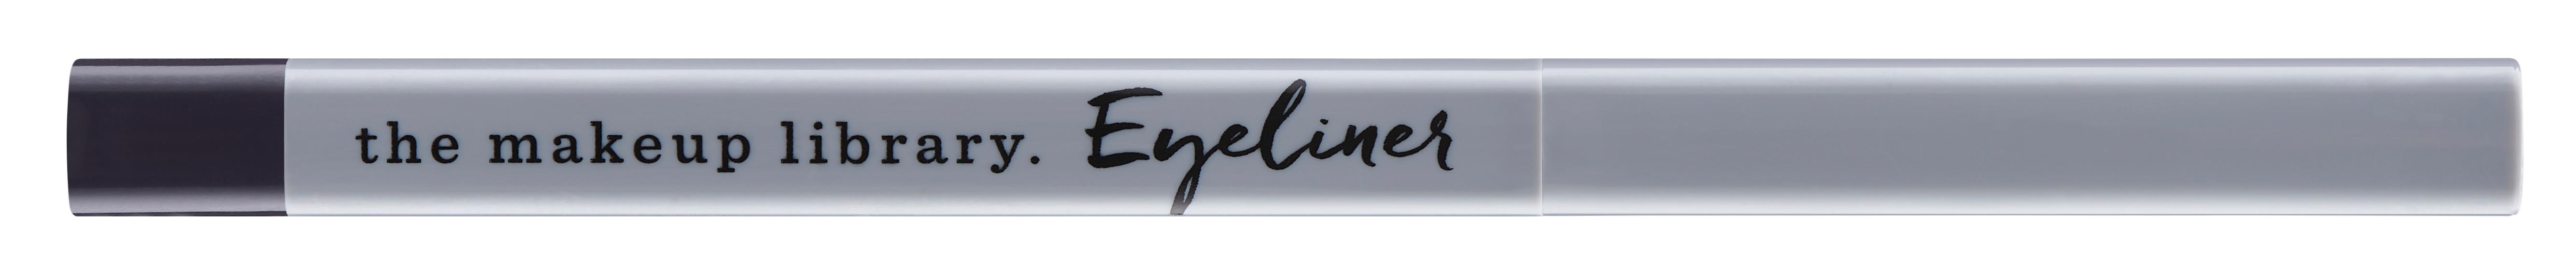 TML - Eyeliner - Denim on Denim